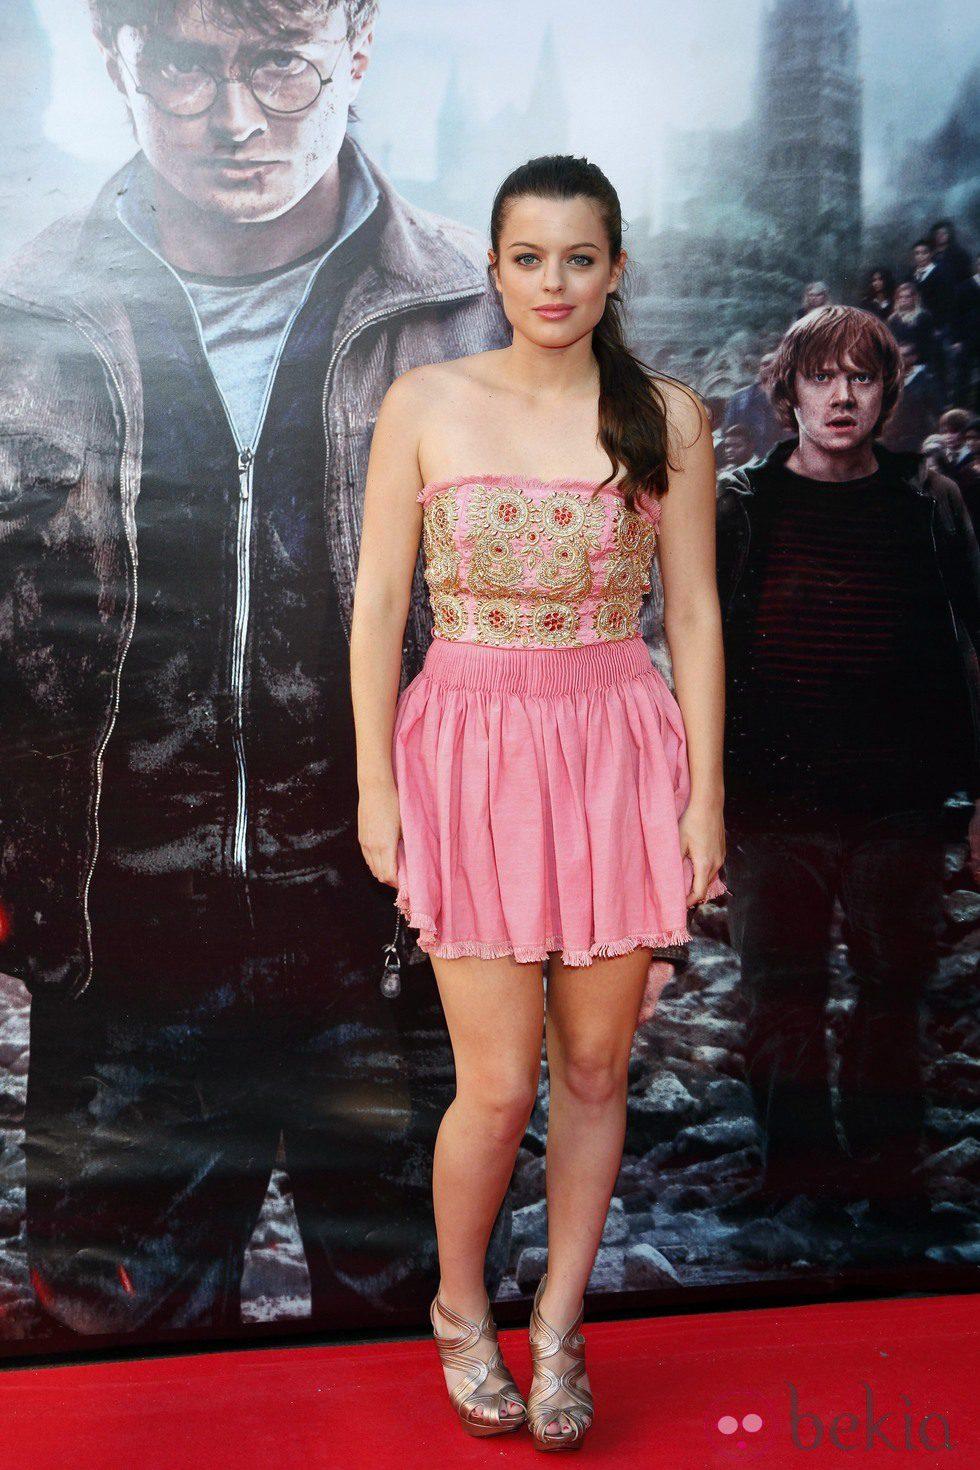 Adriana Torrebejano en el preestreno de Harry Potter en Madrid